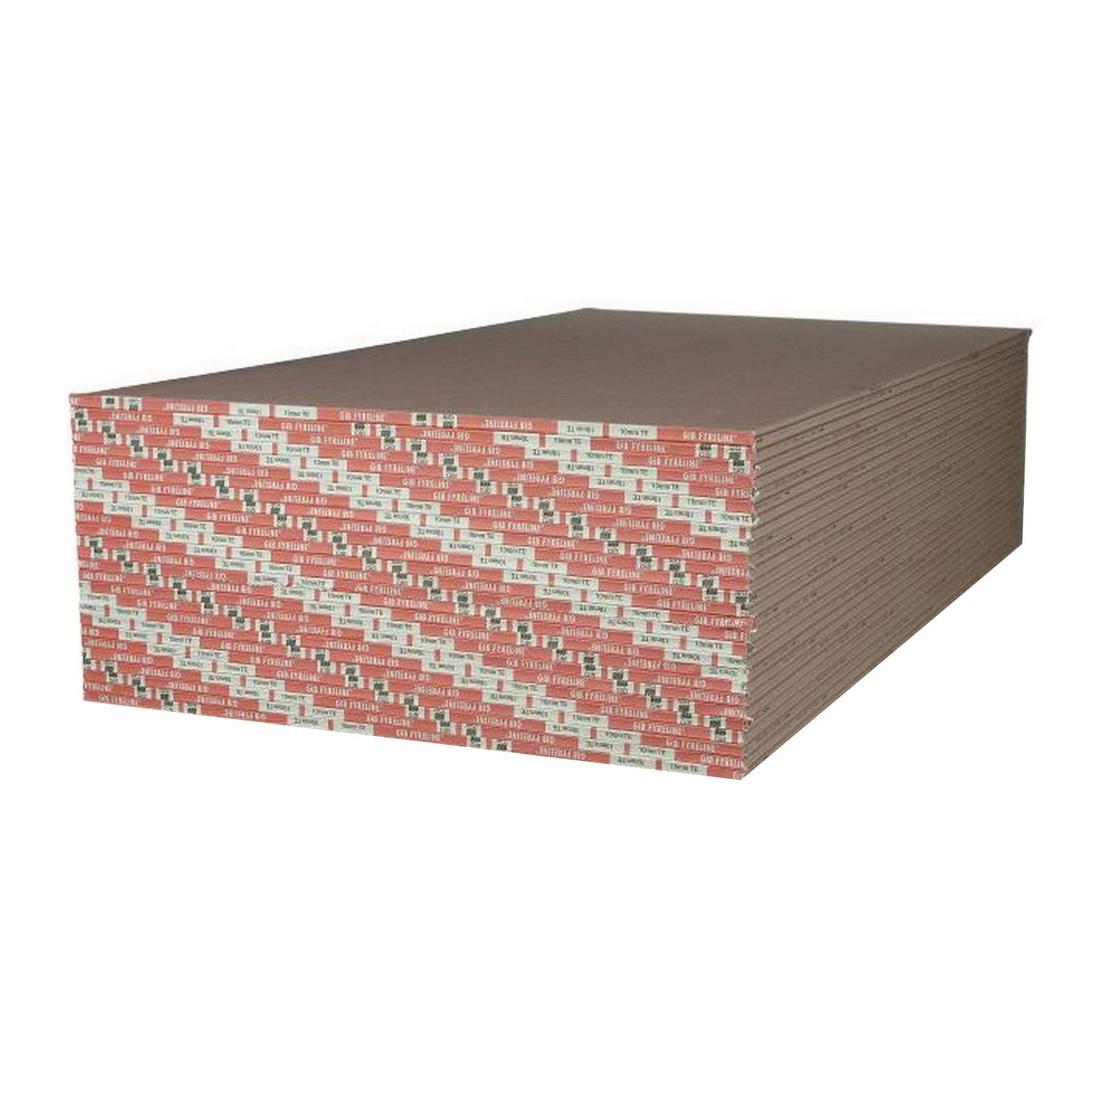 Fyreline Plasterboard 2400 x 1200 x 19mm 11573